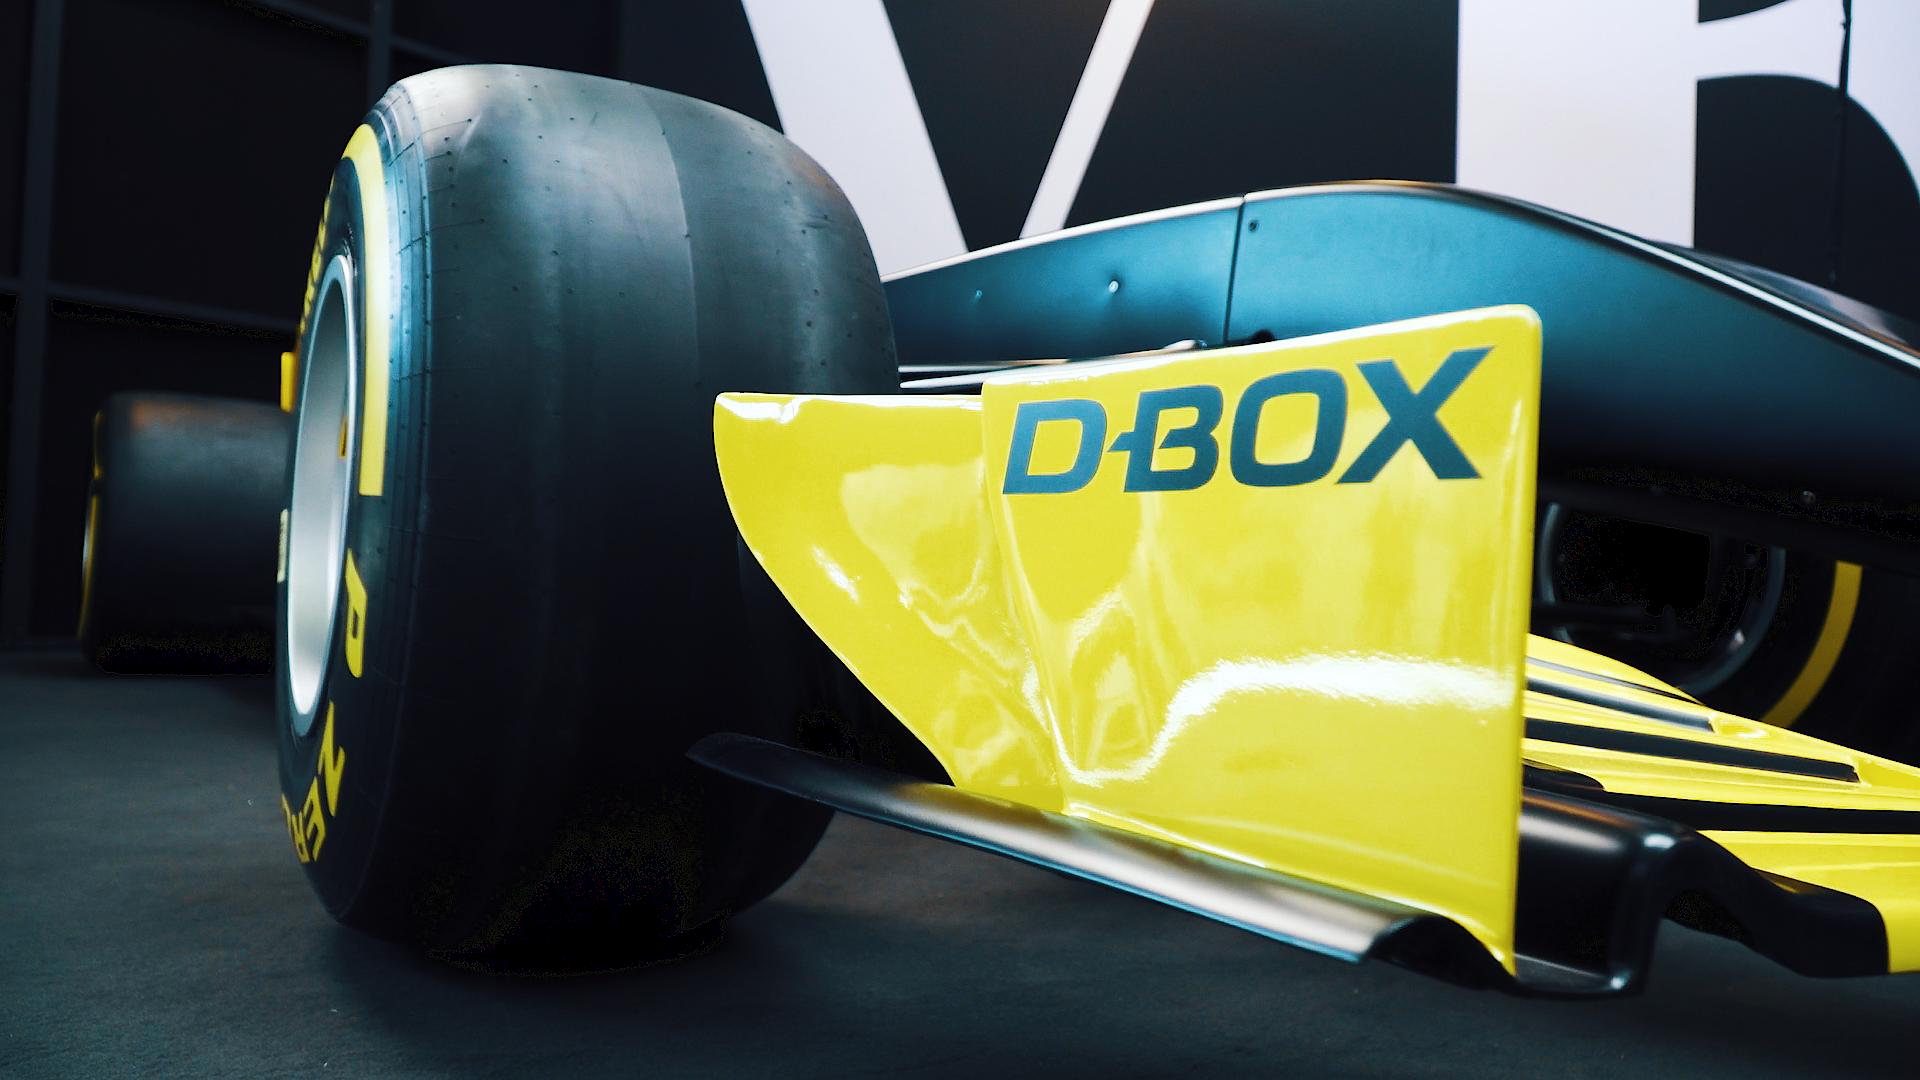 D-BOX labeled formula 1 car